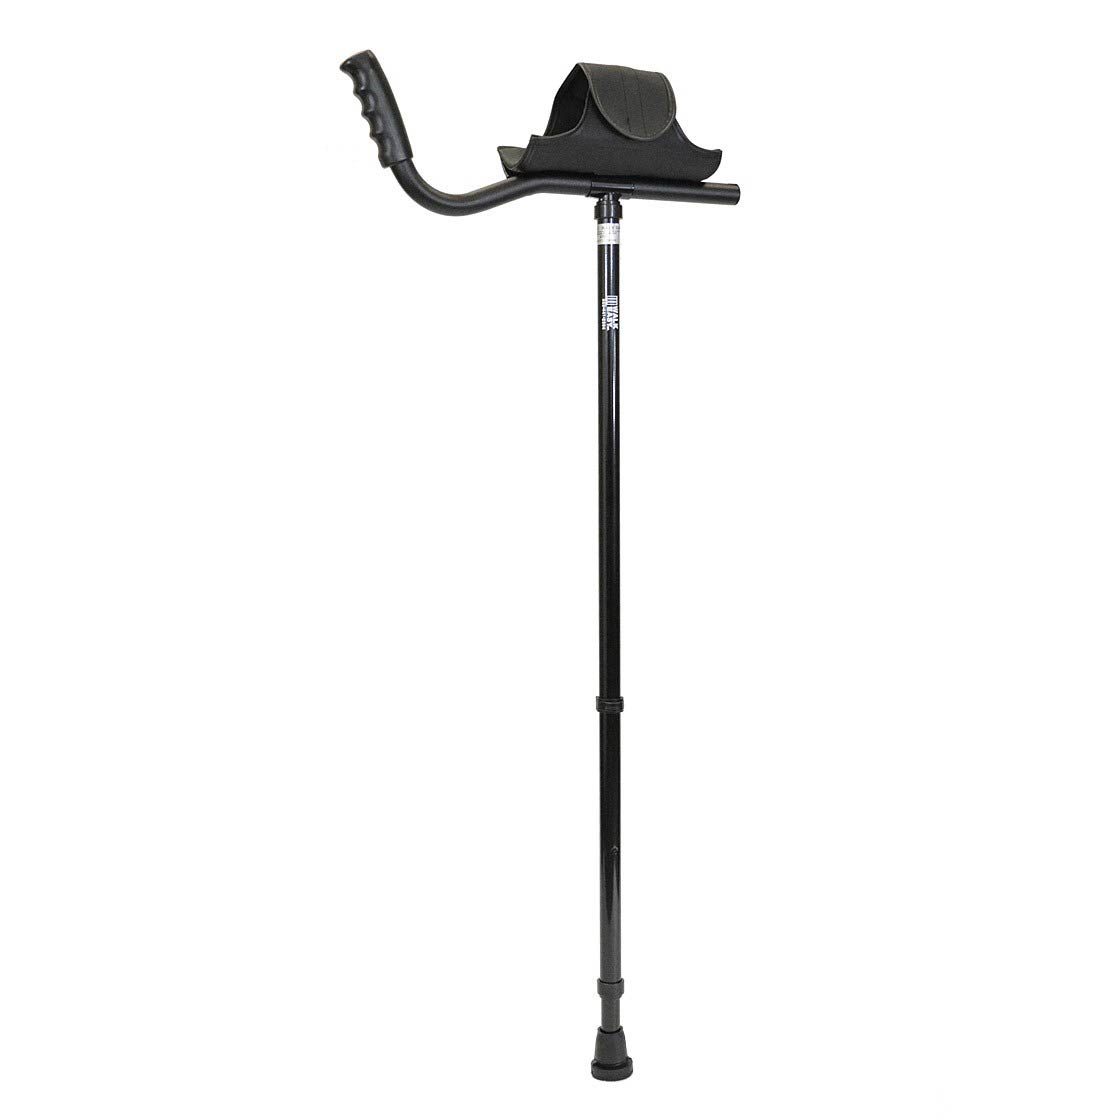 Walk Easy Adult Platform Crutch With Velcro Sleeve | Adult Platform Crutch